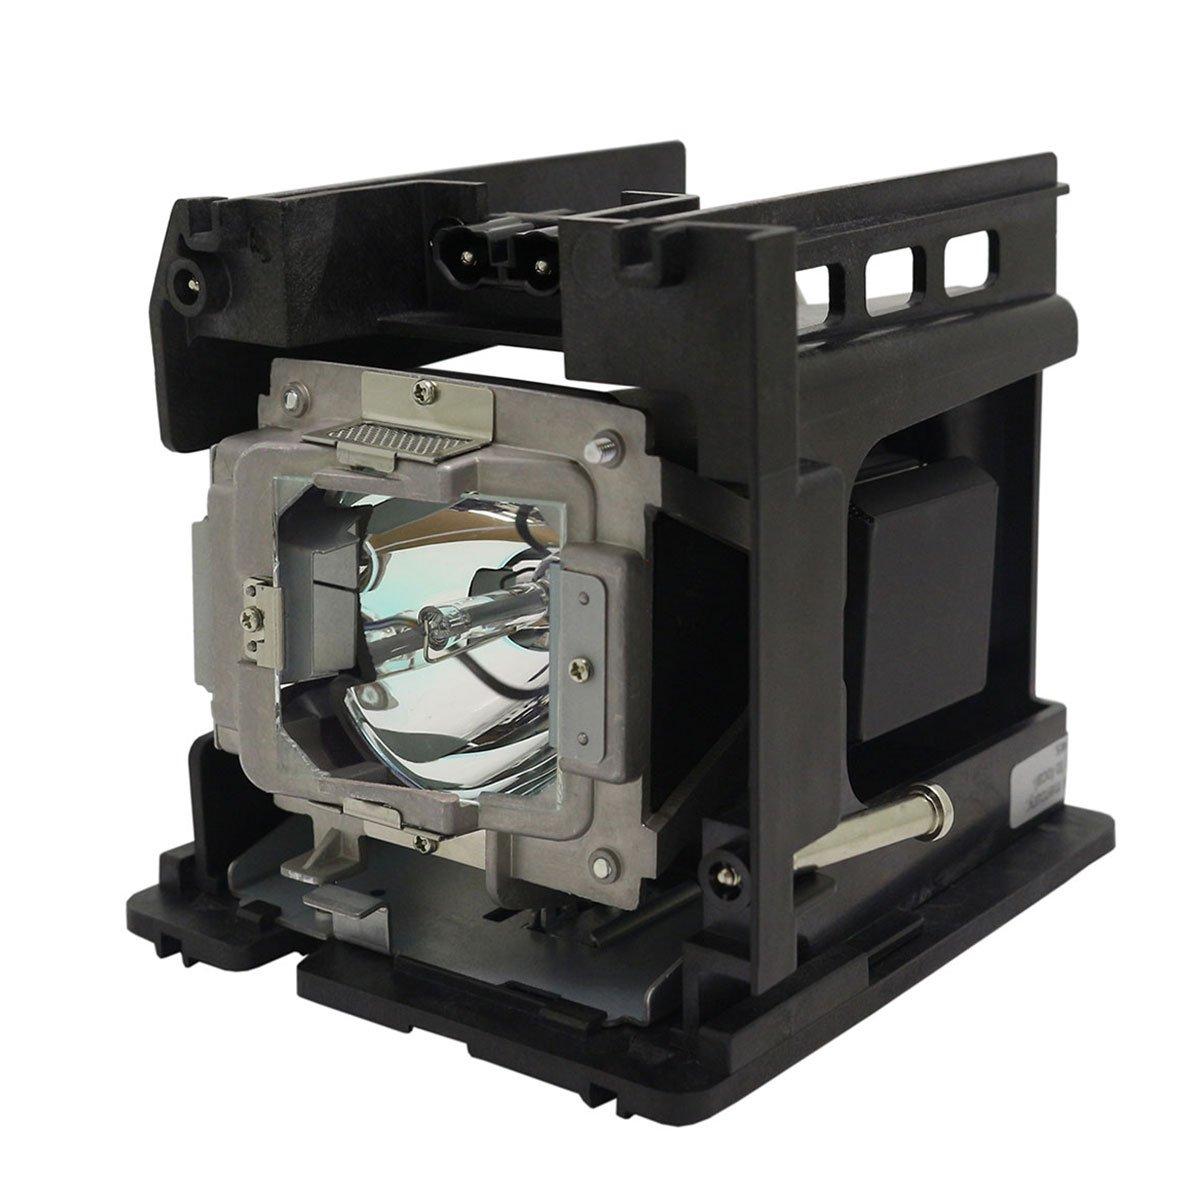 SpArc Platinum for Vivitek 5811118452-SVV Projector Lamp with Enclosure by Sparc Bulbs (Image #1)